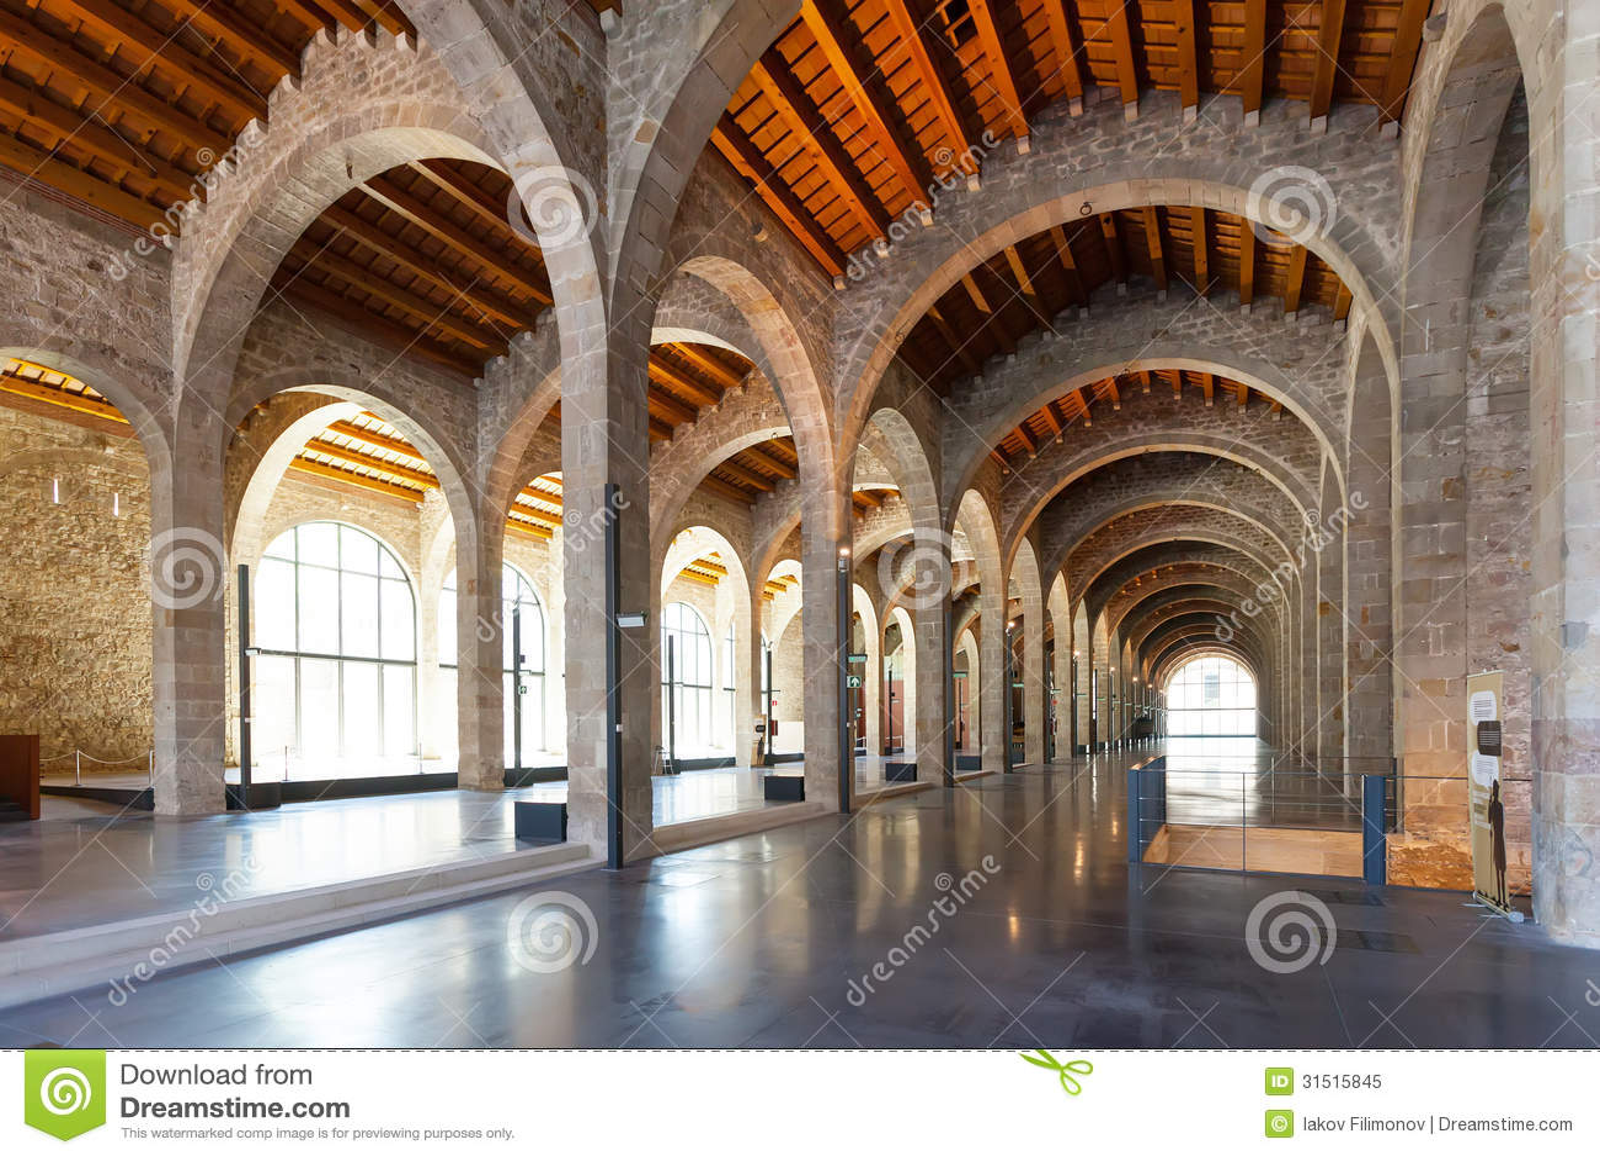 Interior Of Museu Maritim De Barcelona Editorial Image - Image: 31515845